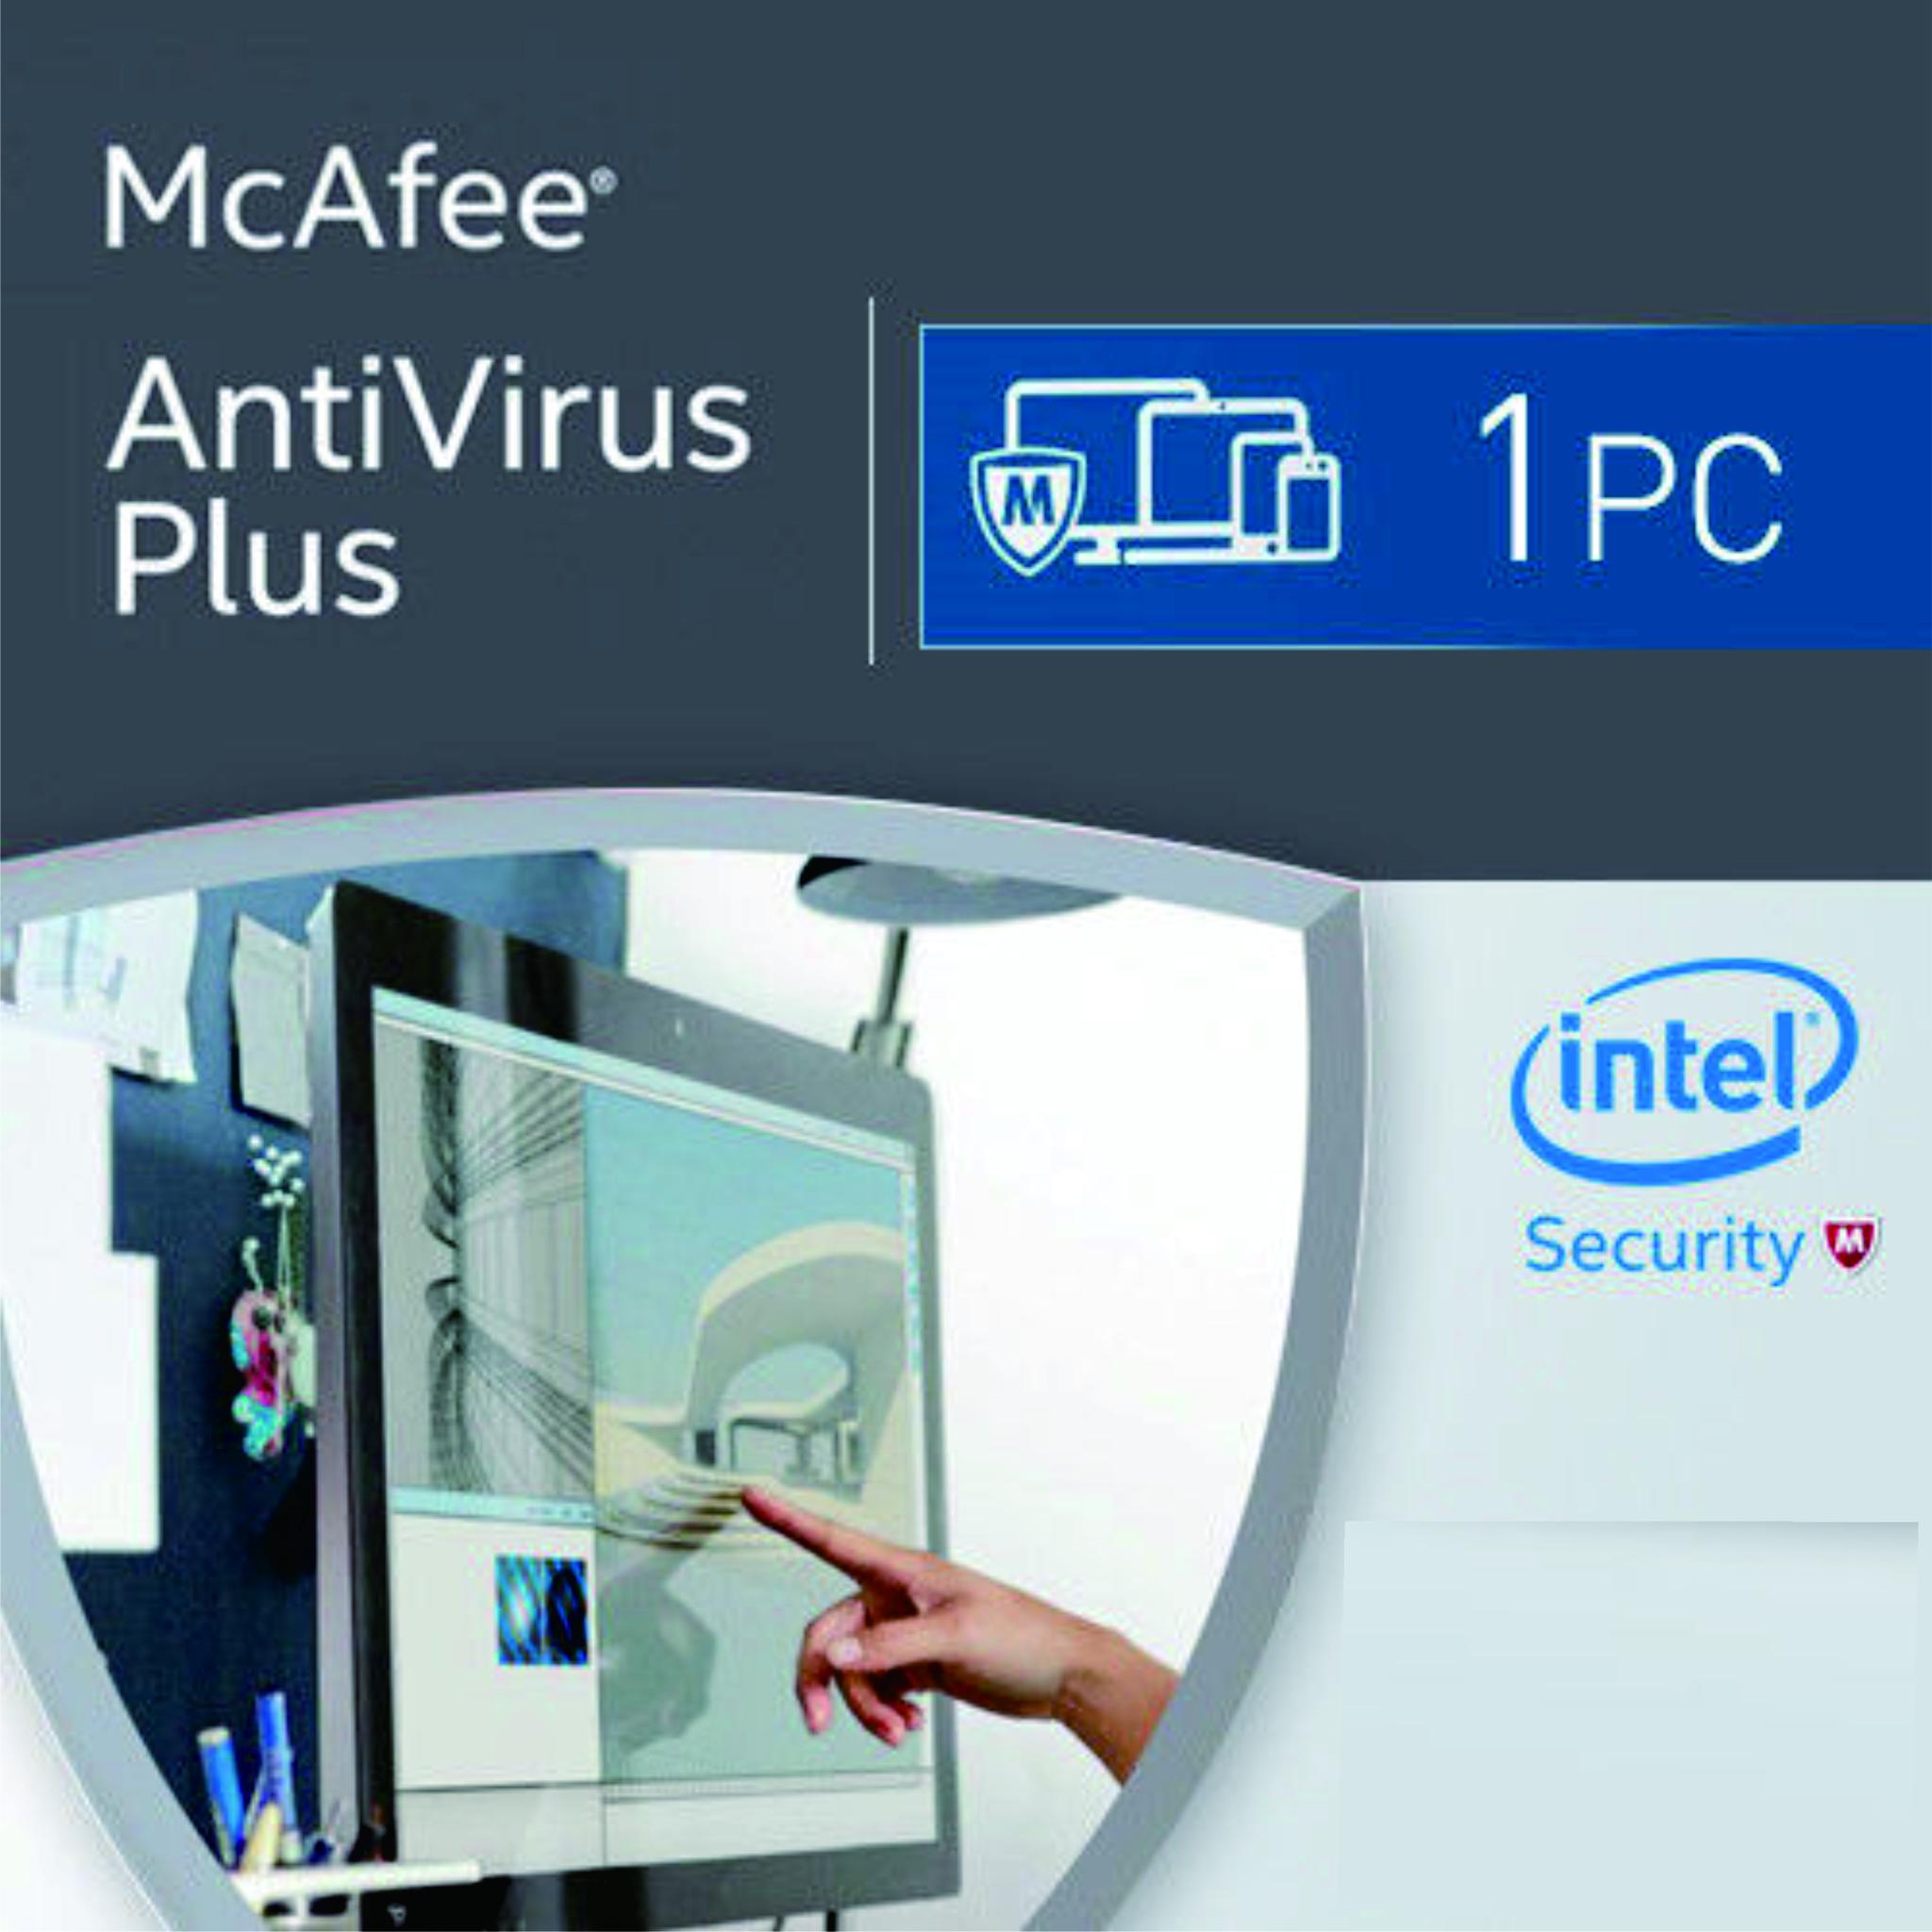 Jual Mcafee Antivirus Plus 2016 1pc 1user Igcmania Tokopedia Anti Virus Internet Security 3 Tahun 1 User